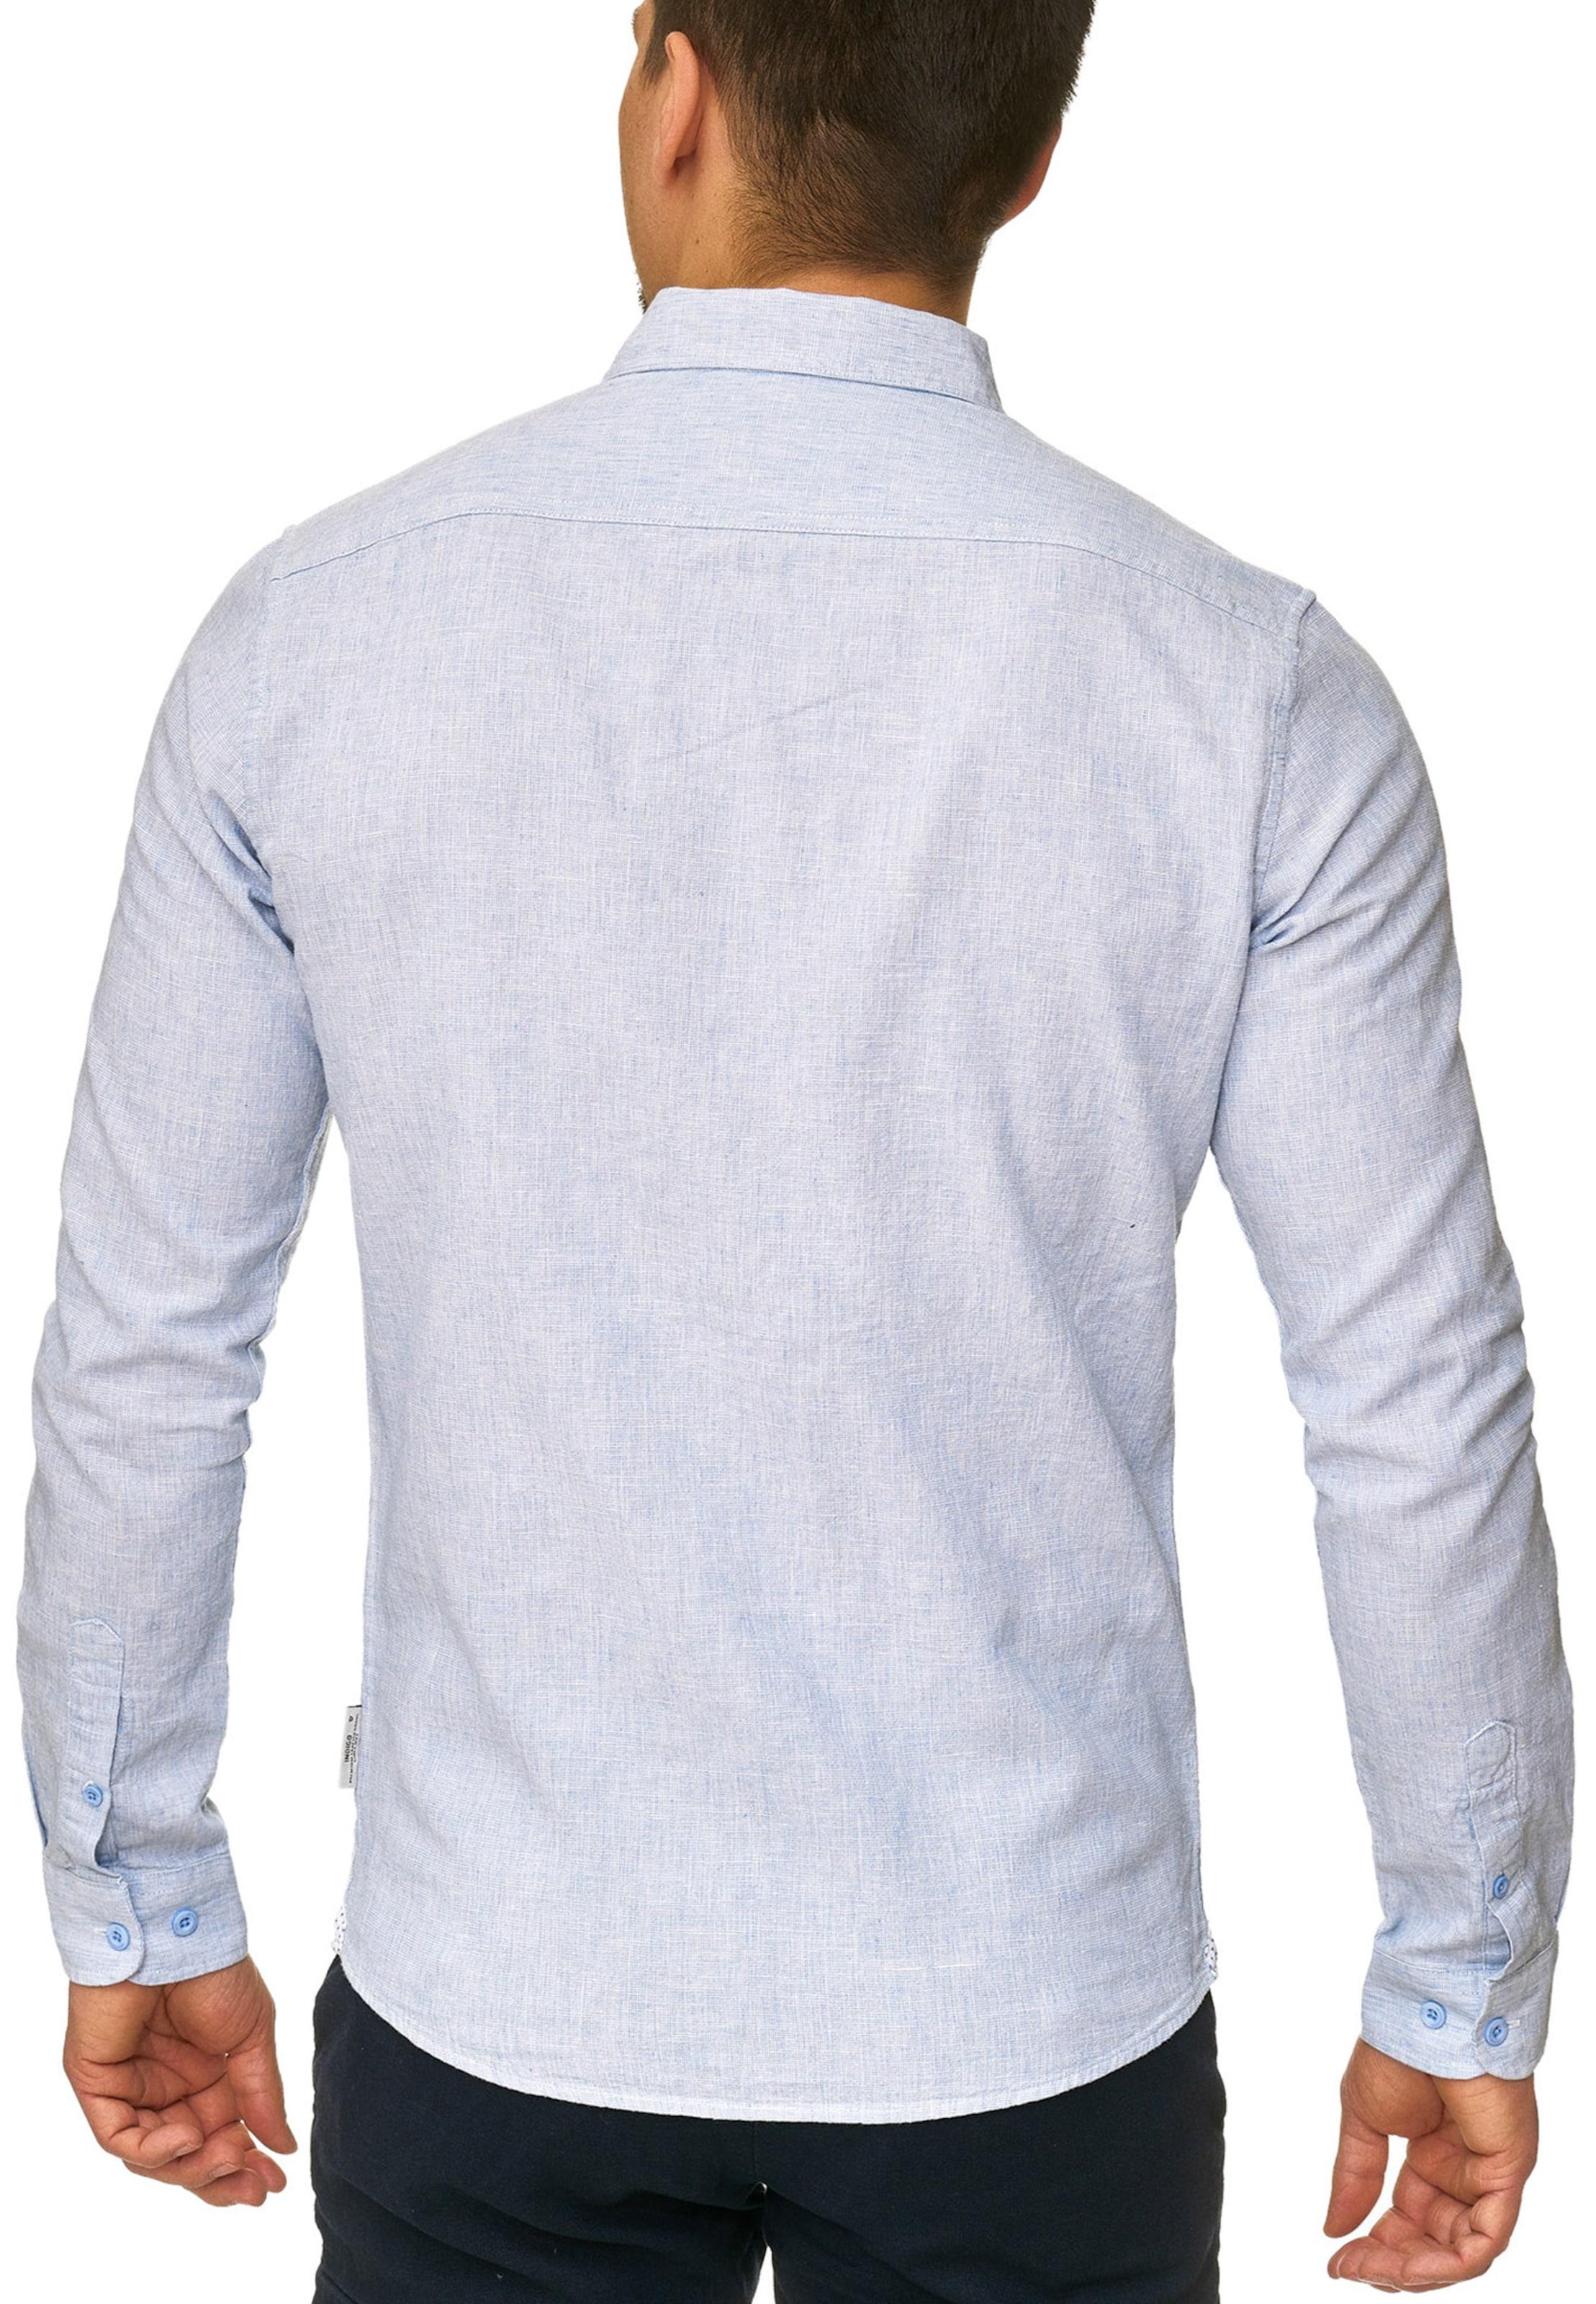 En Jeans Chemise Gris 'cundy' Indicode Ygv6b7Ify